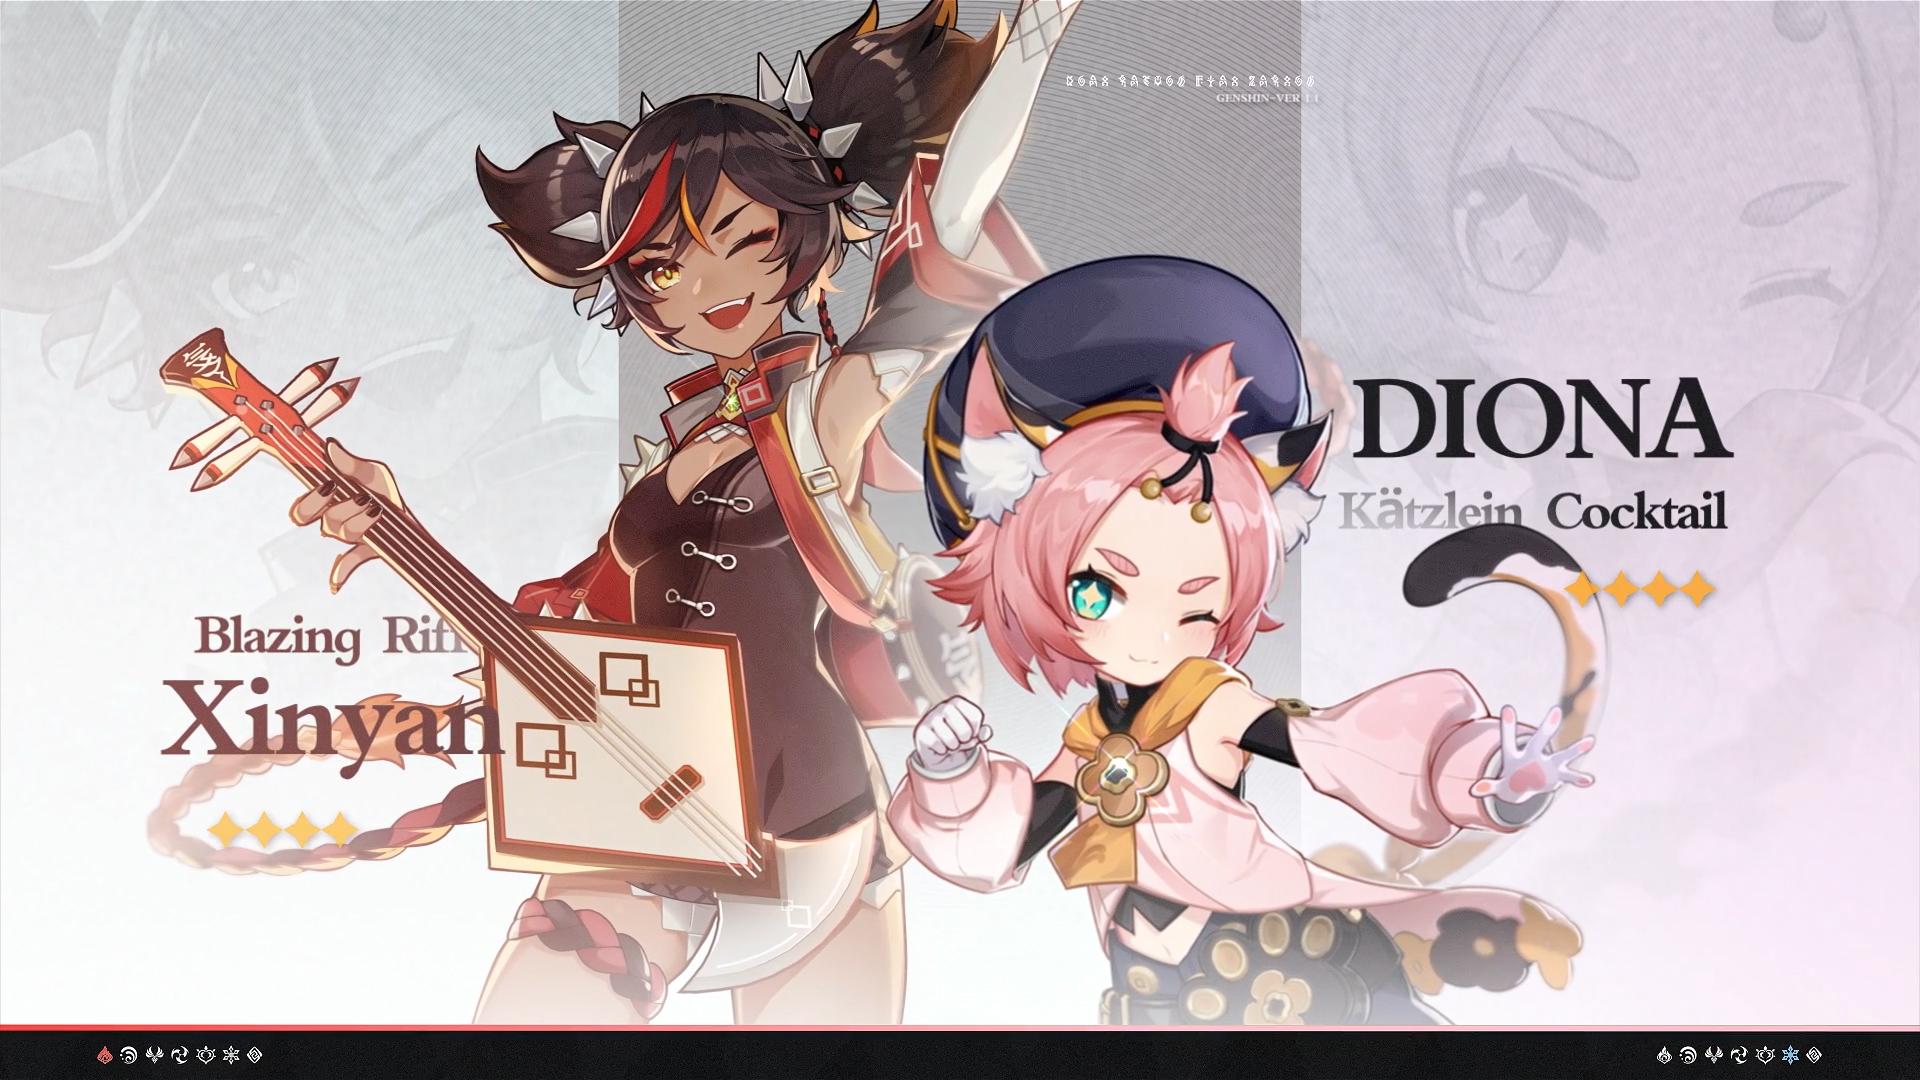 Genshin Impact Xinyan and Diona